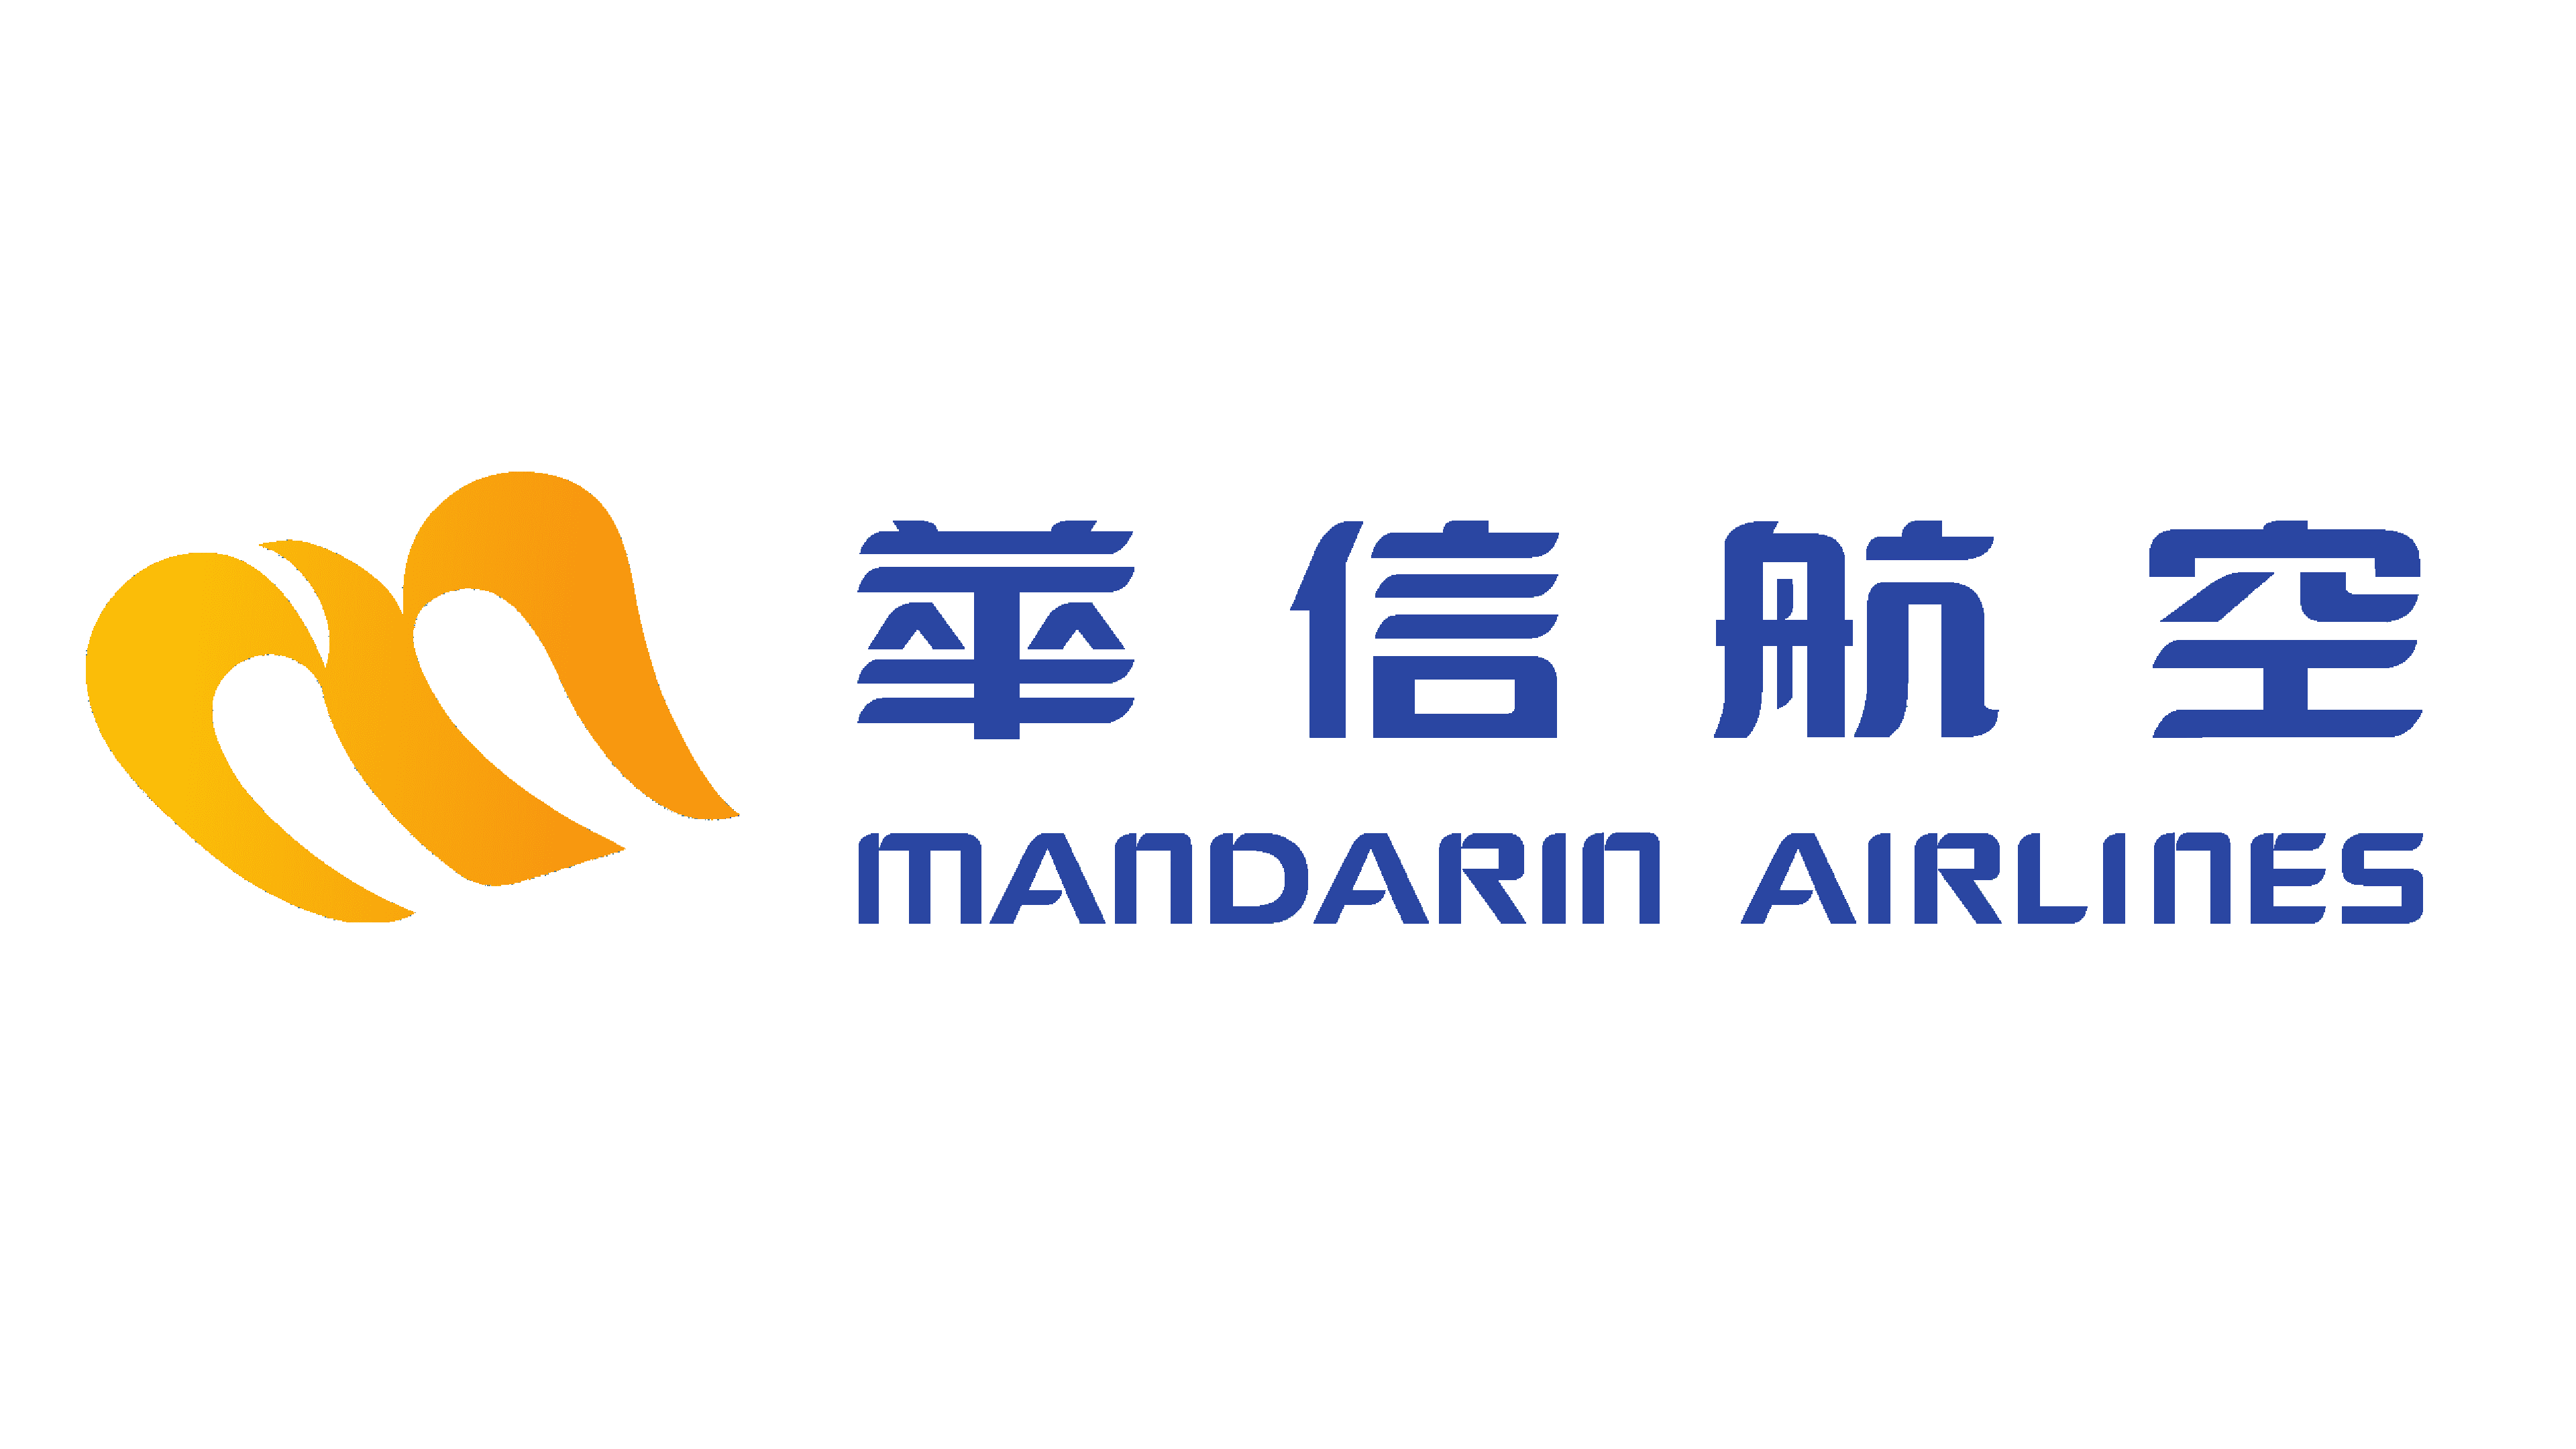 Mandarin Airlines Logo Logo